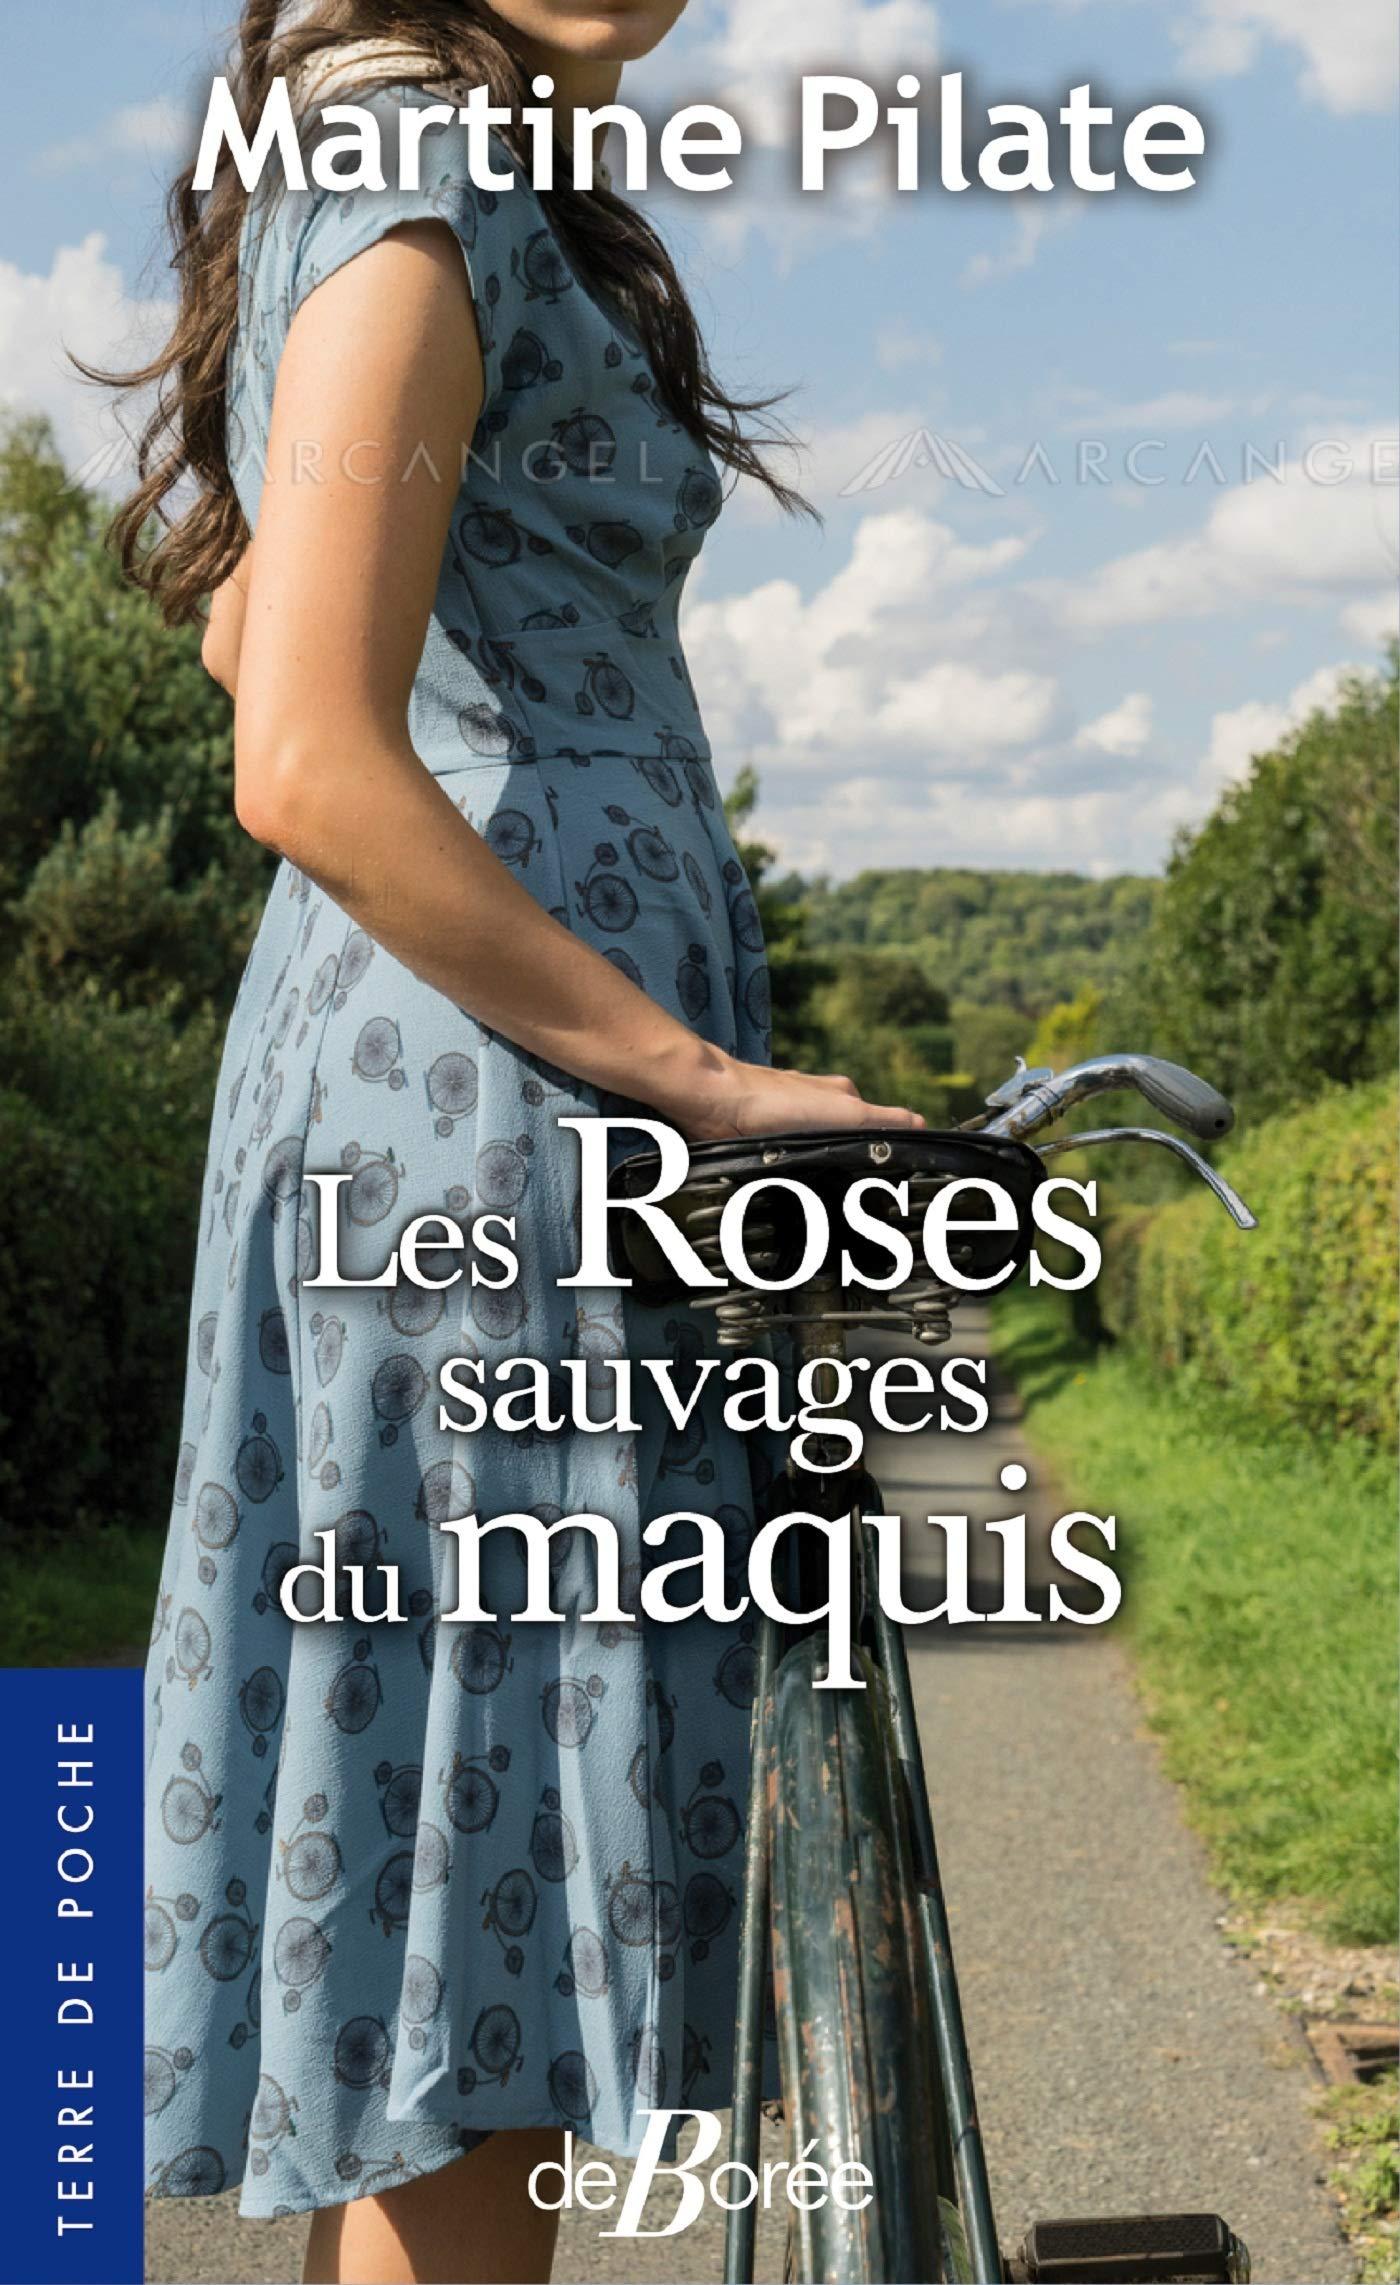 Les roses sauvages du maquis (Terre de poche): Amazon.es: Pilate, Martine: Libros en idiomas extranjeros